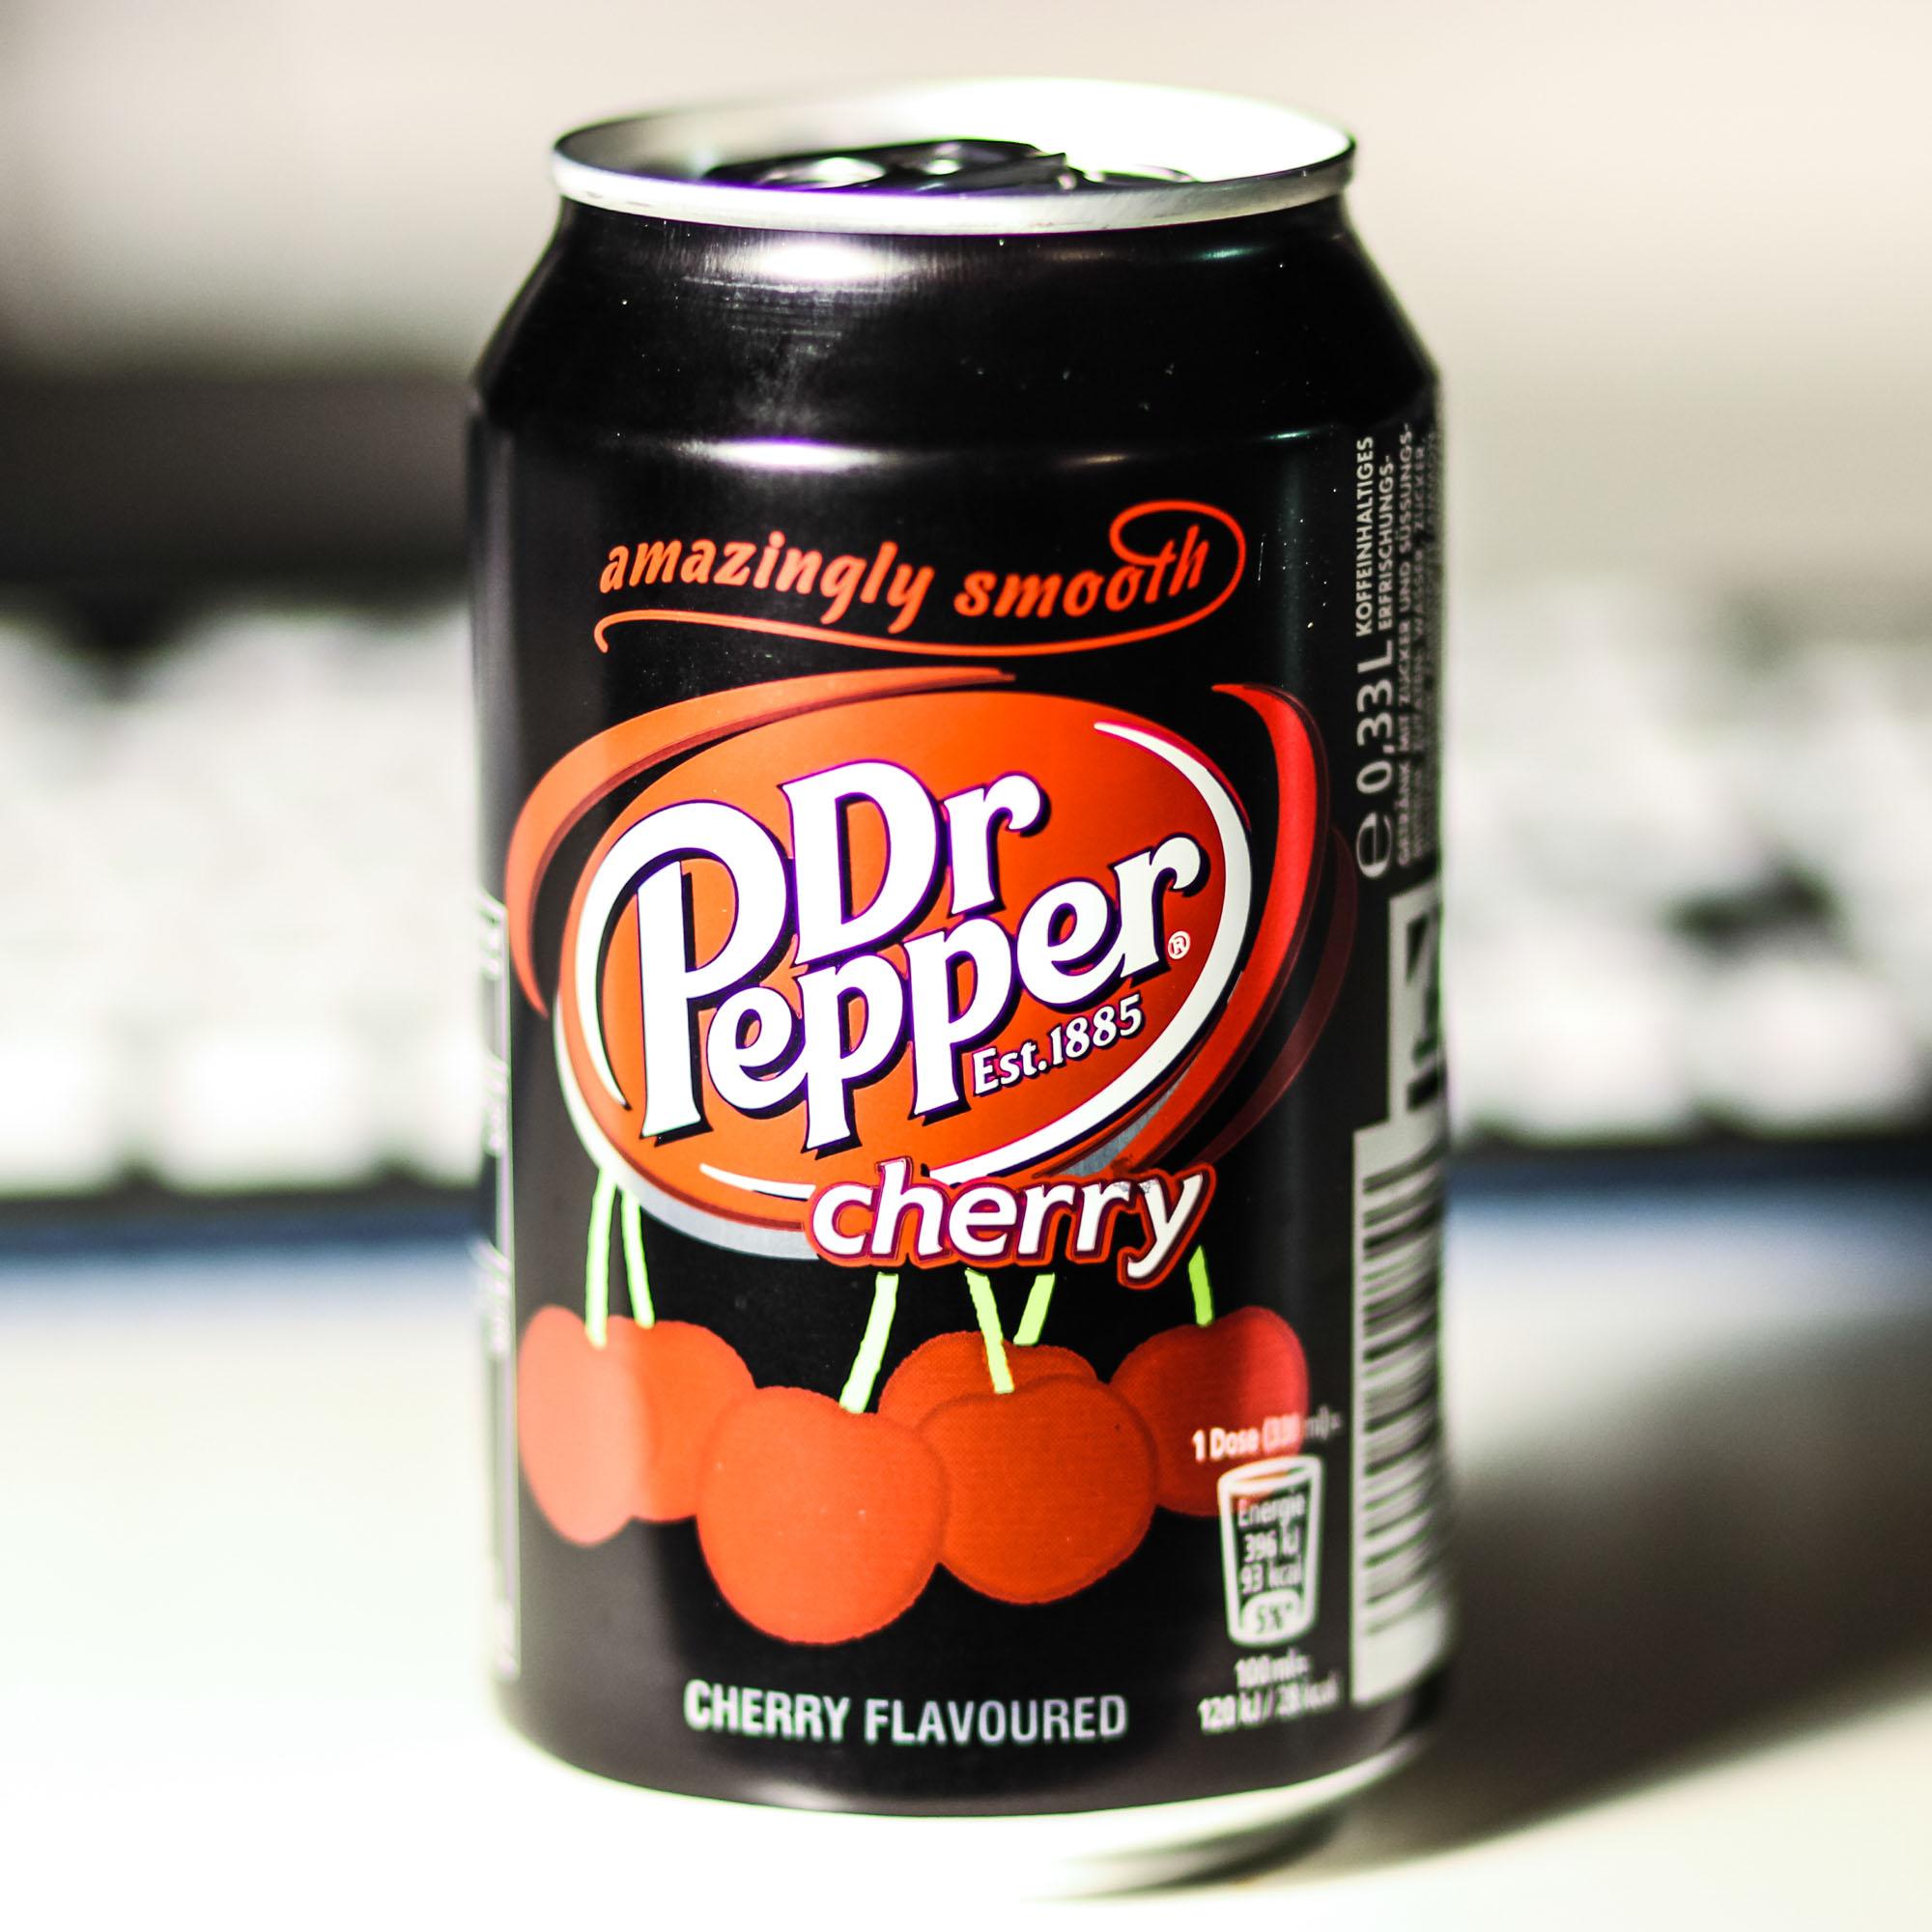 dr-pepper-cherry-photo-by-alexander-grosse-strangmann